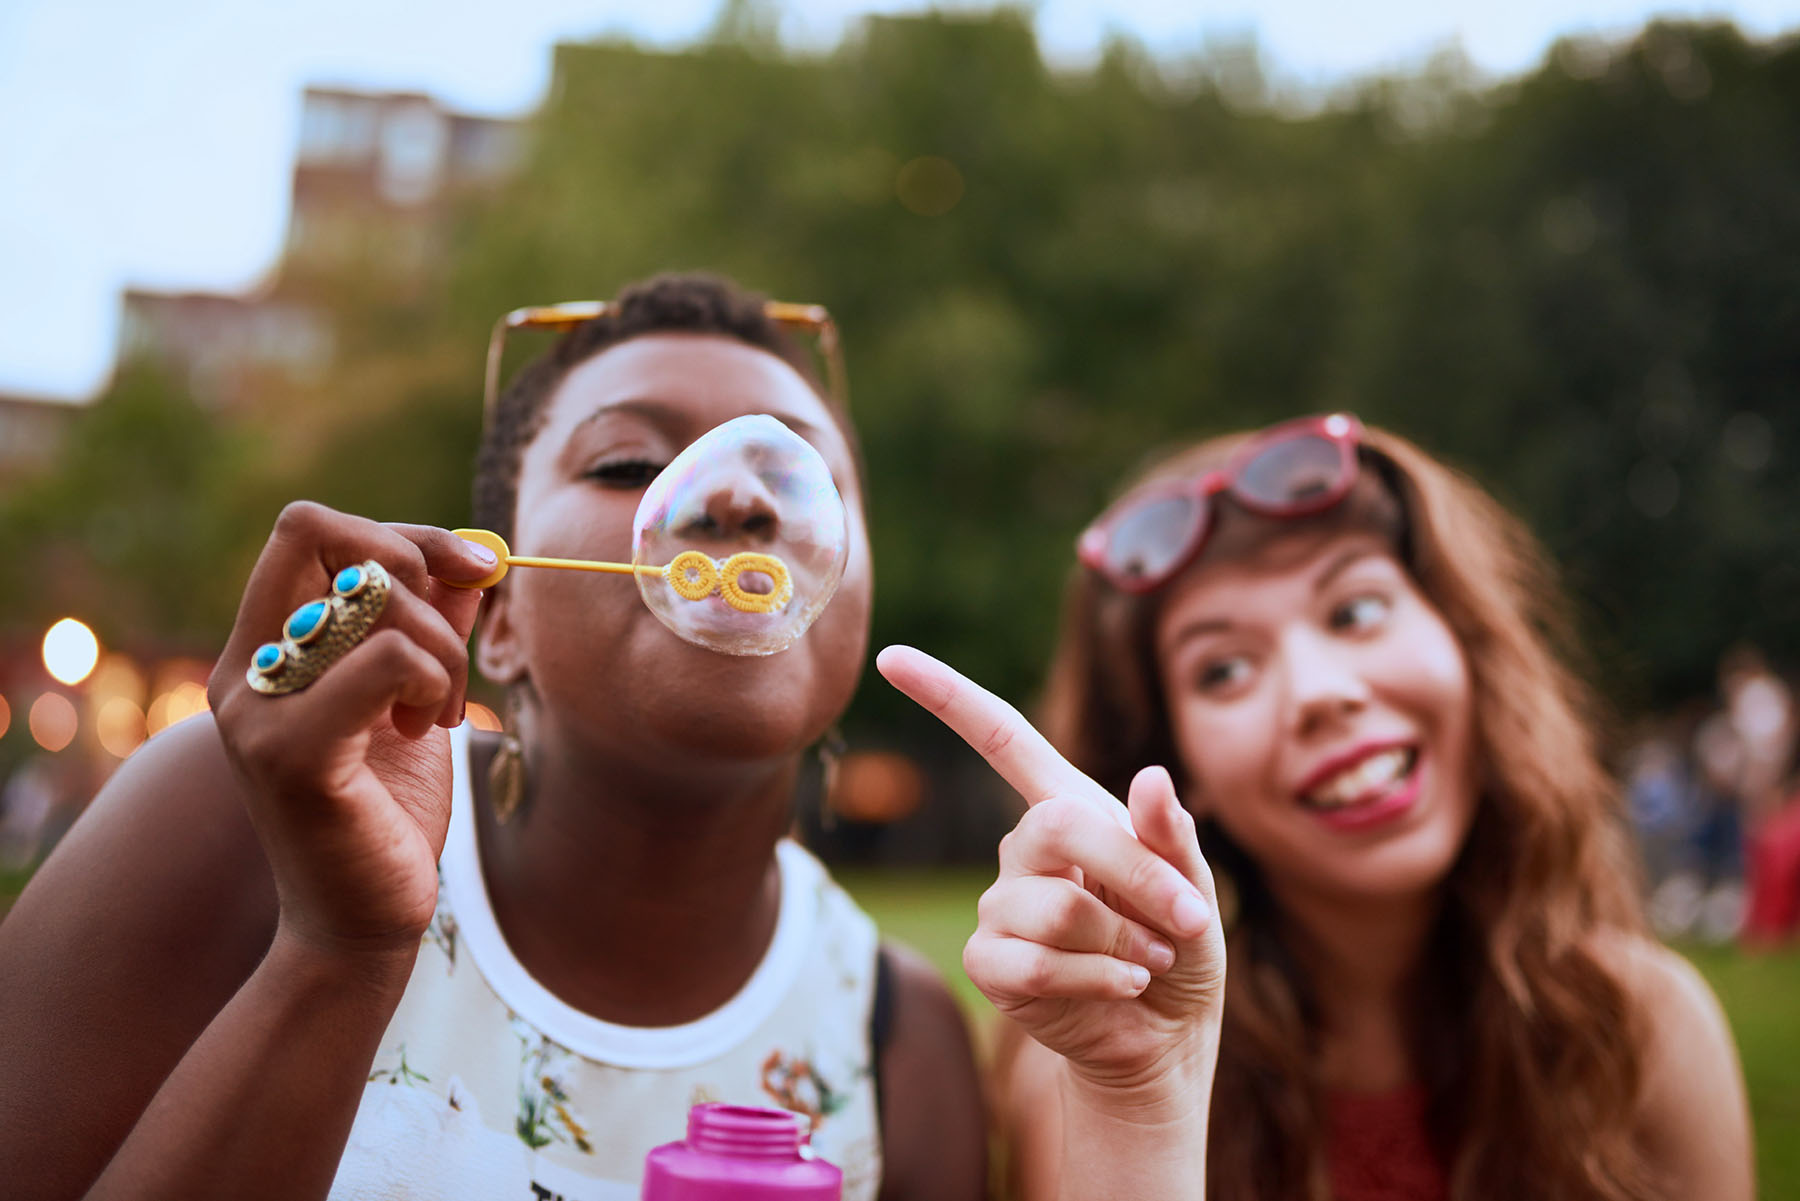 Skip Coachella, Grab Your Passport & Hit These 5 International Music Festivals